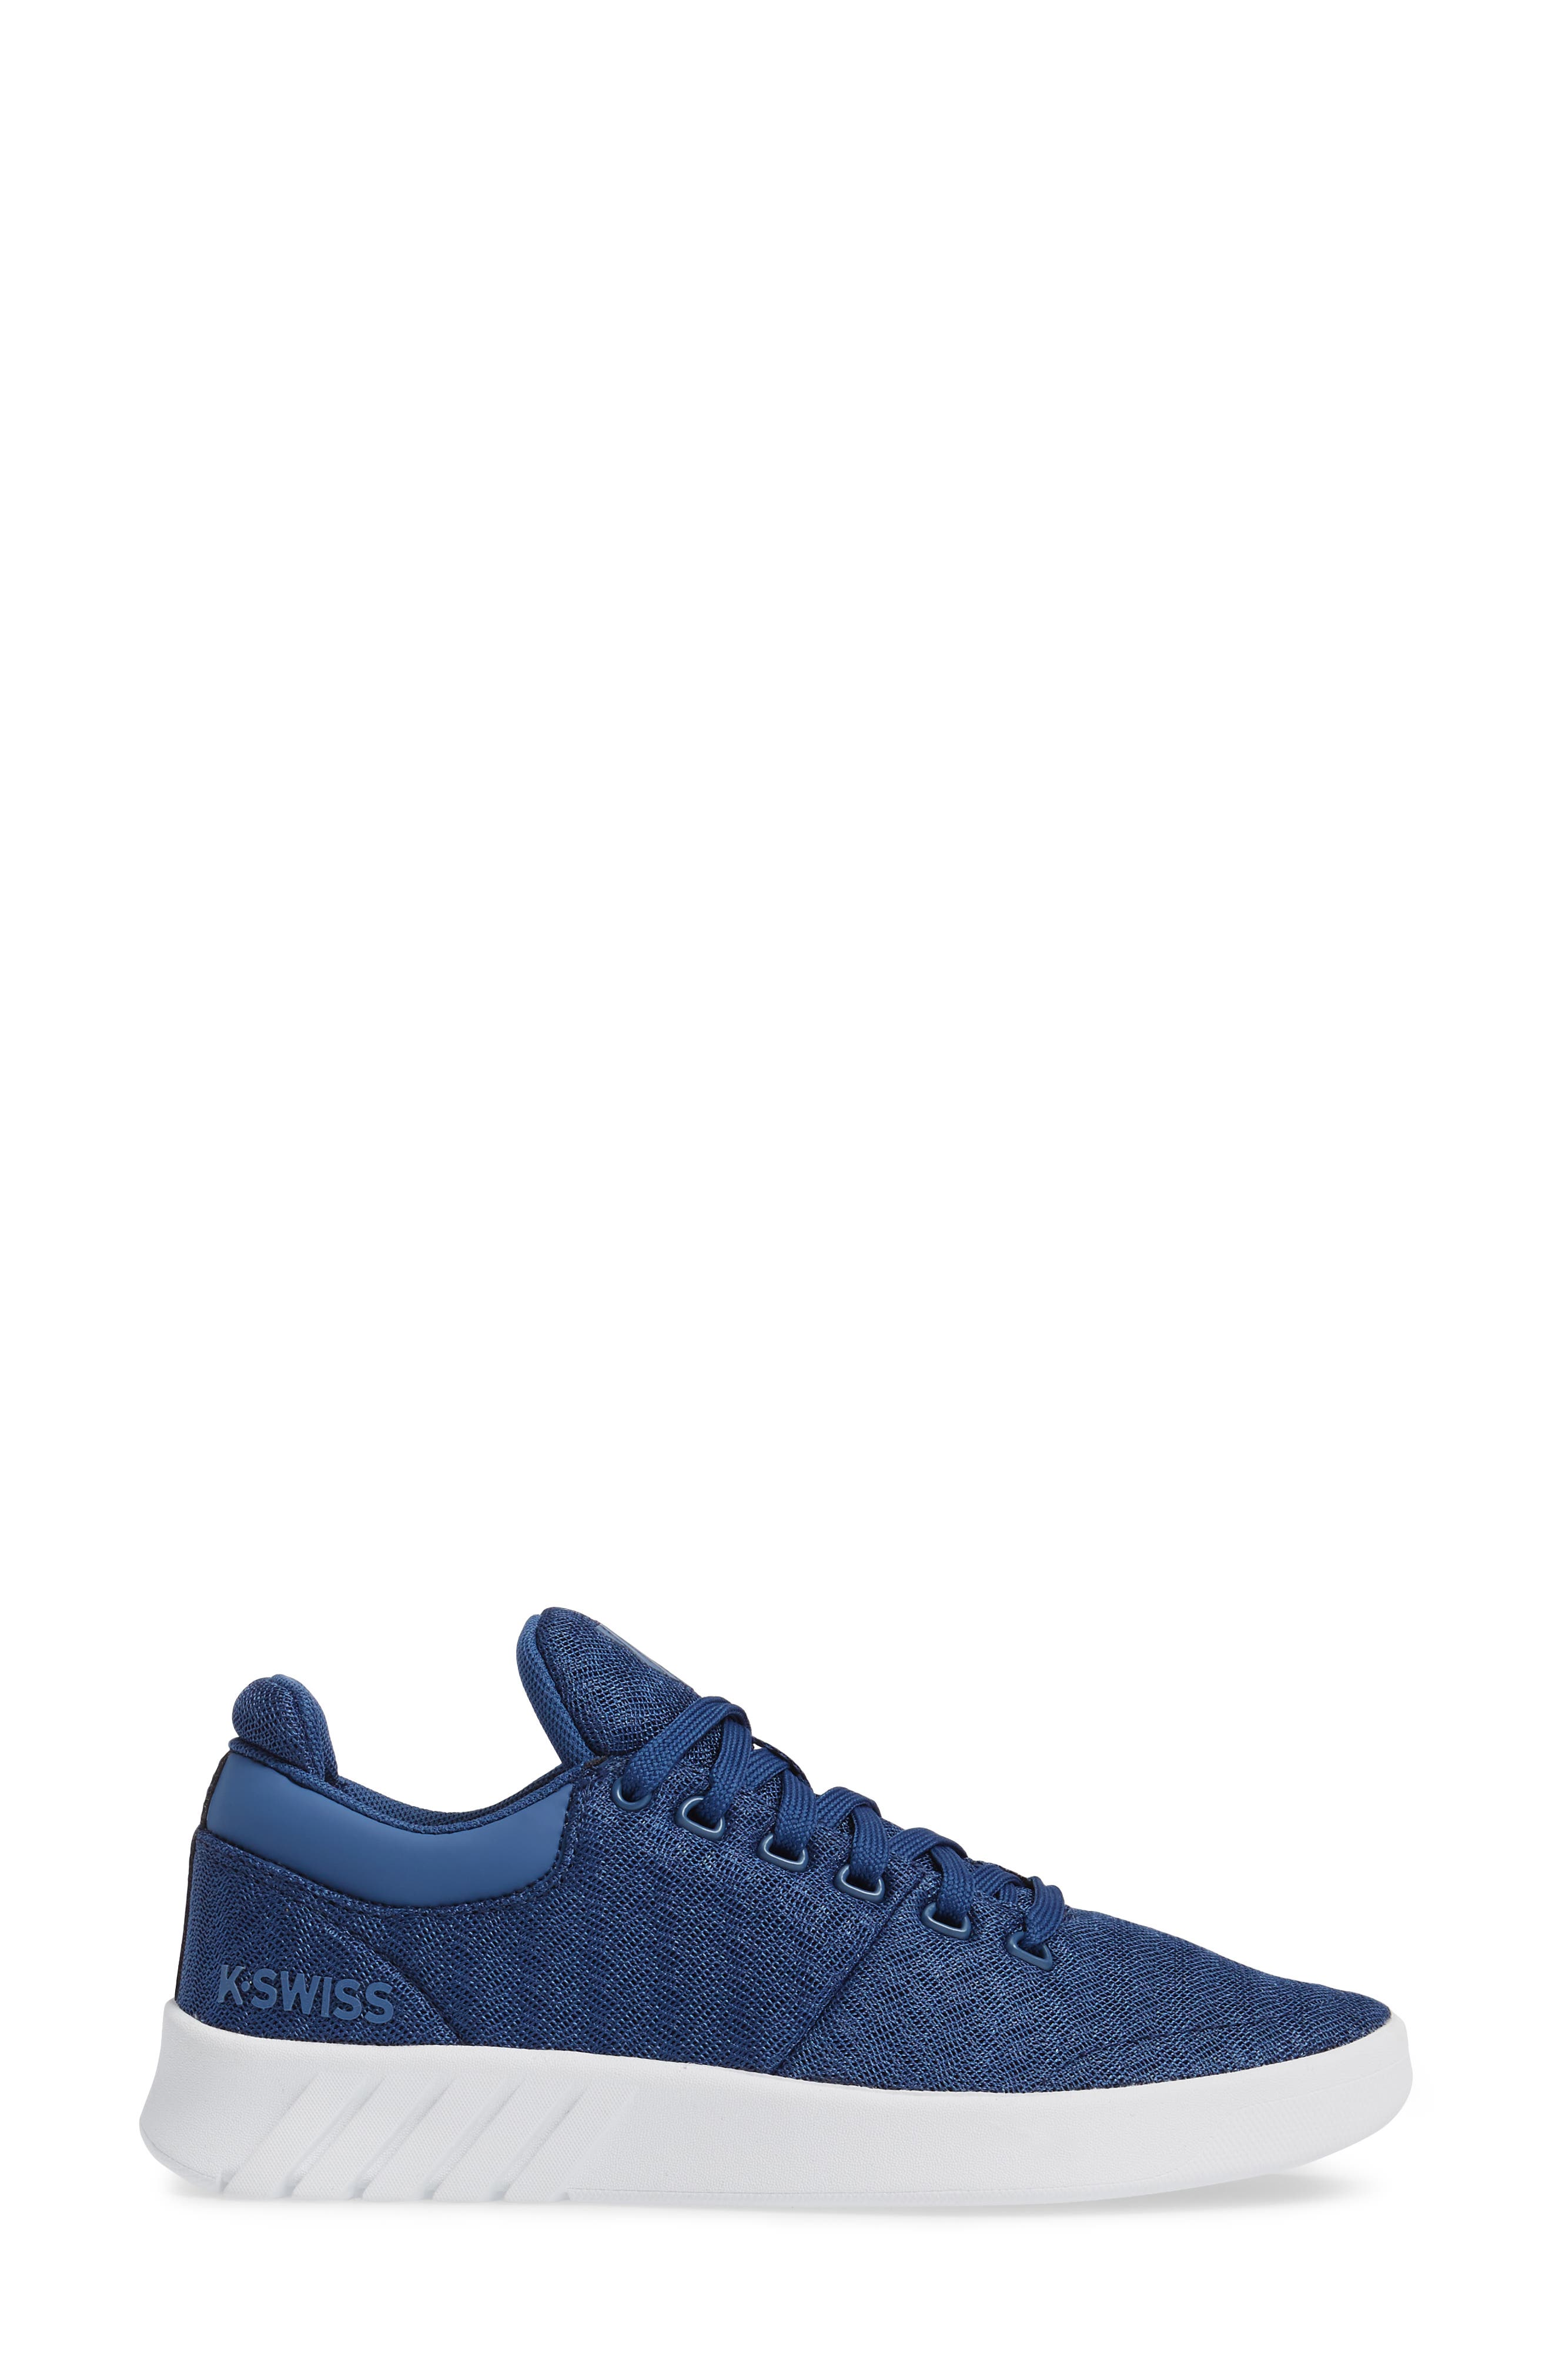 Alternate Image 3  - K-Swiss Aero Trainer T Sneaker (Women)